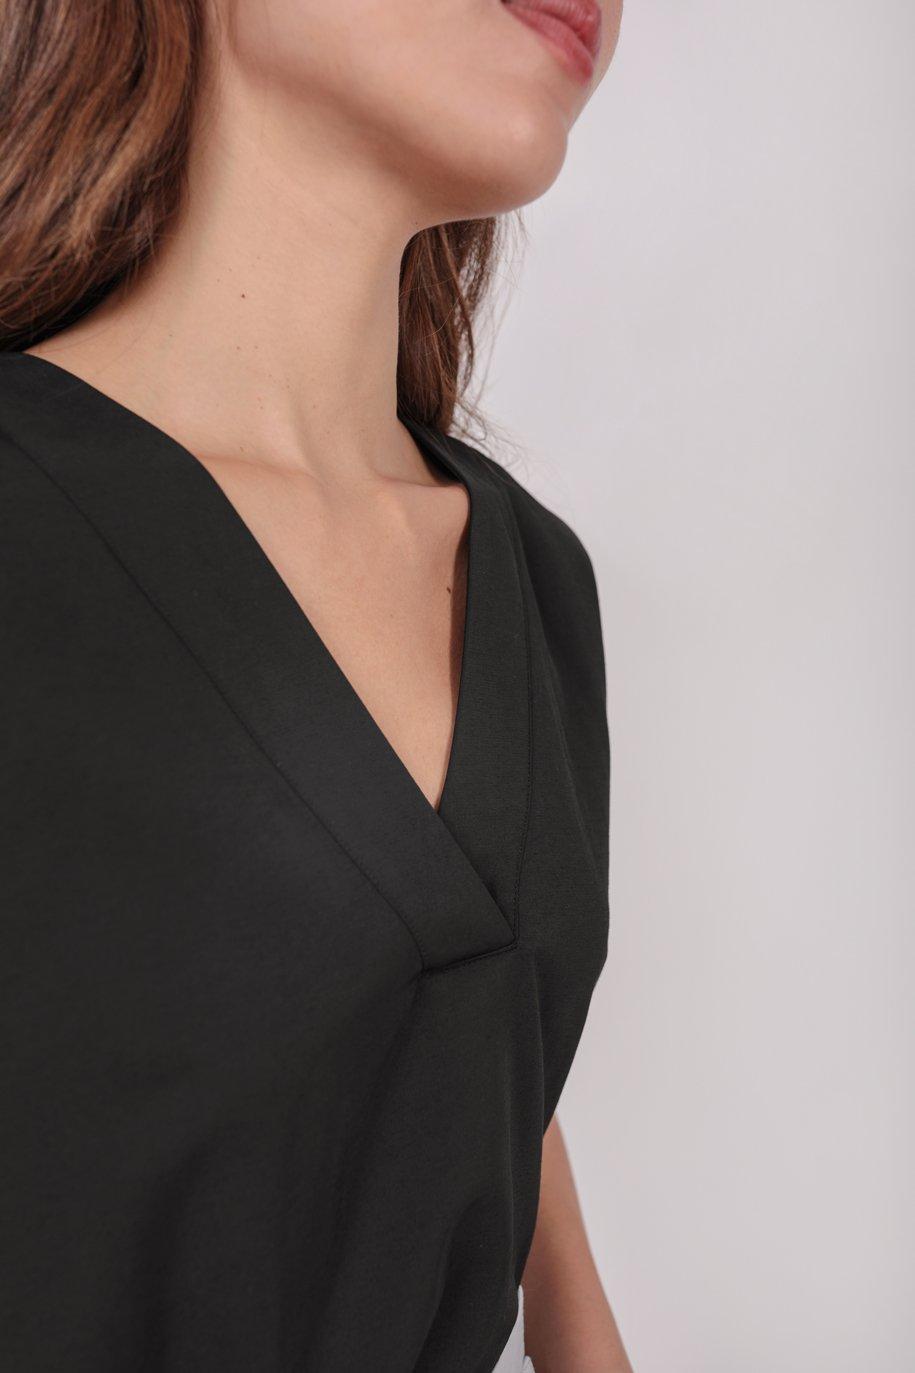 Laurent Sleeved Top (Black)